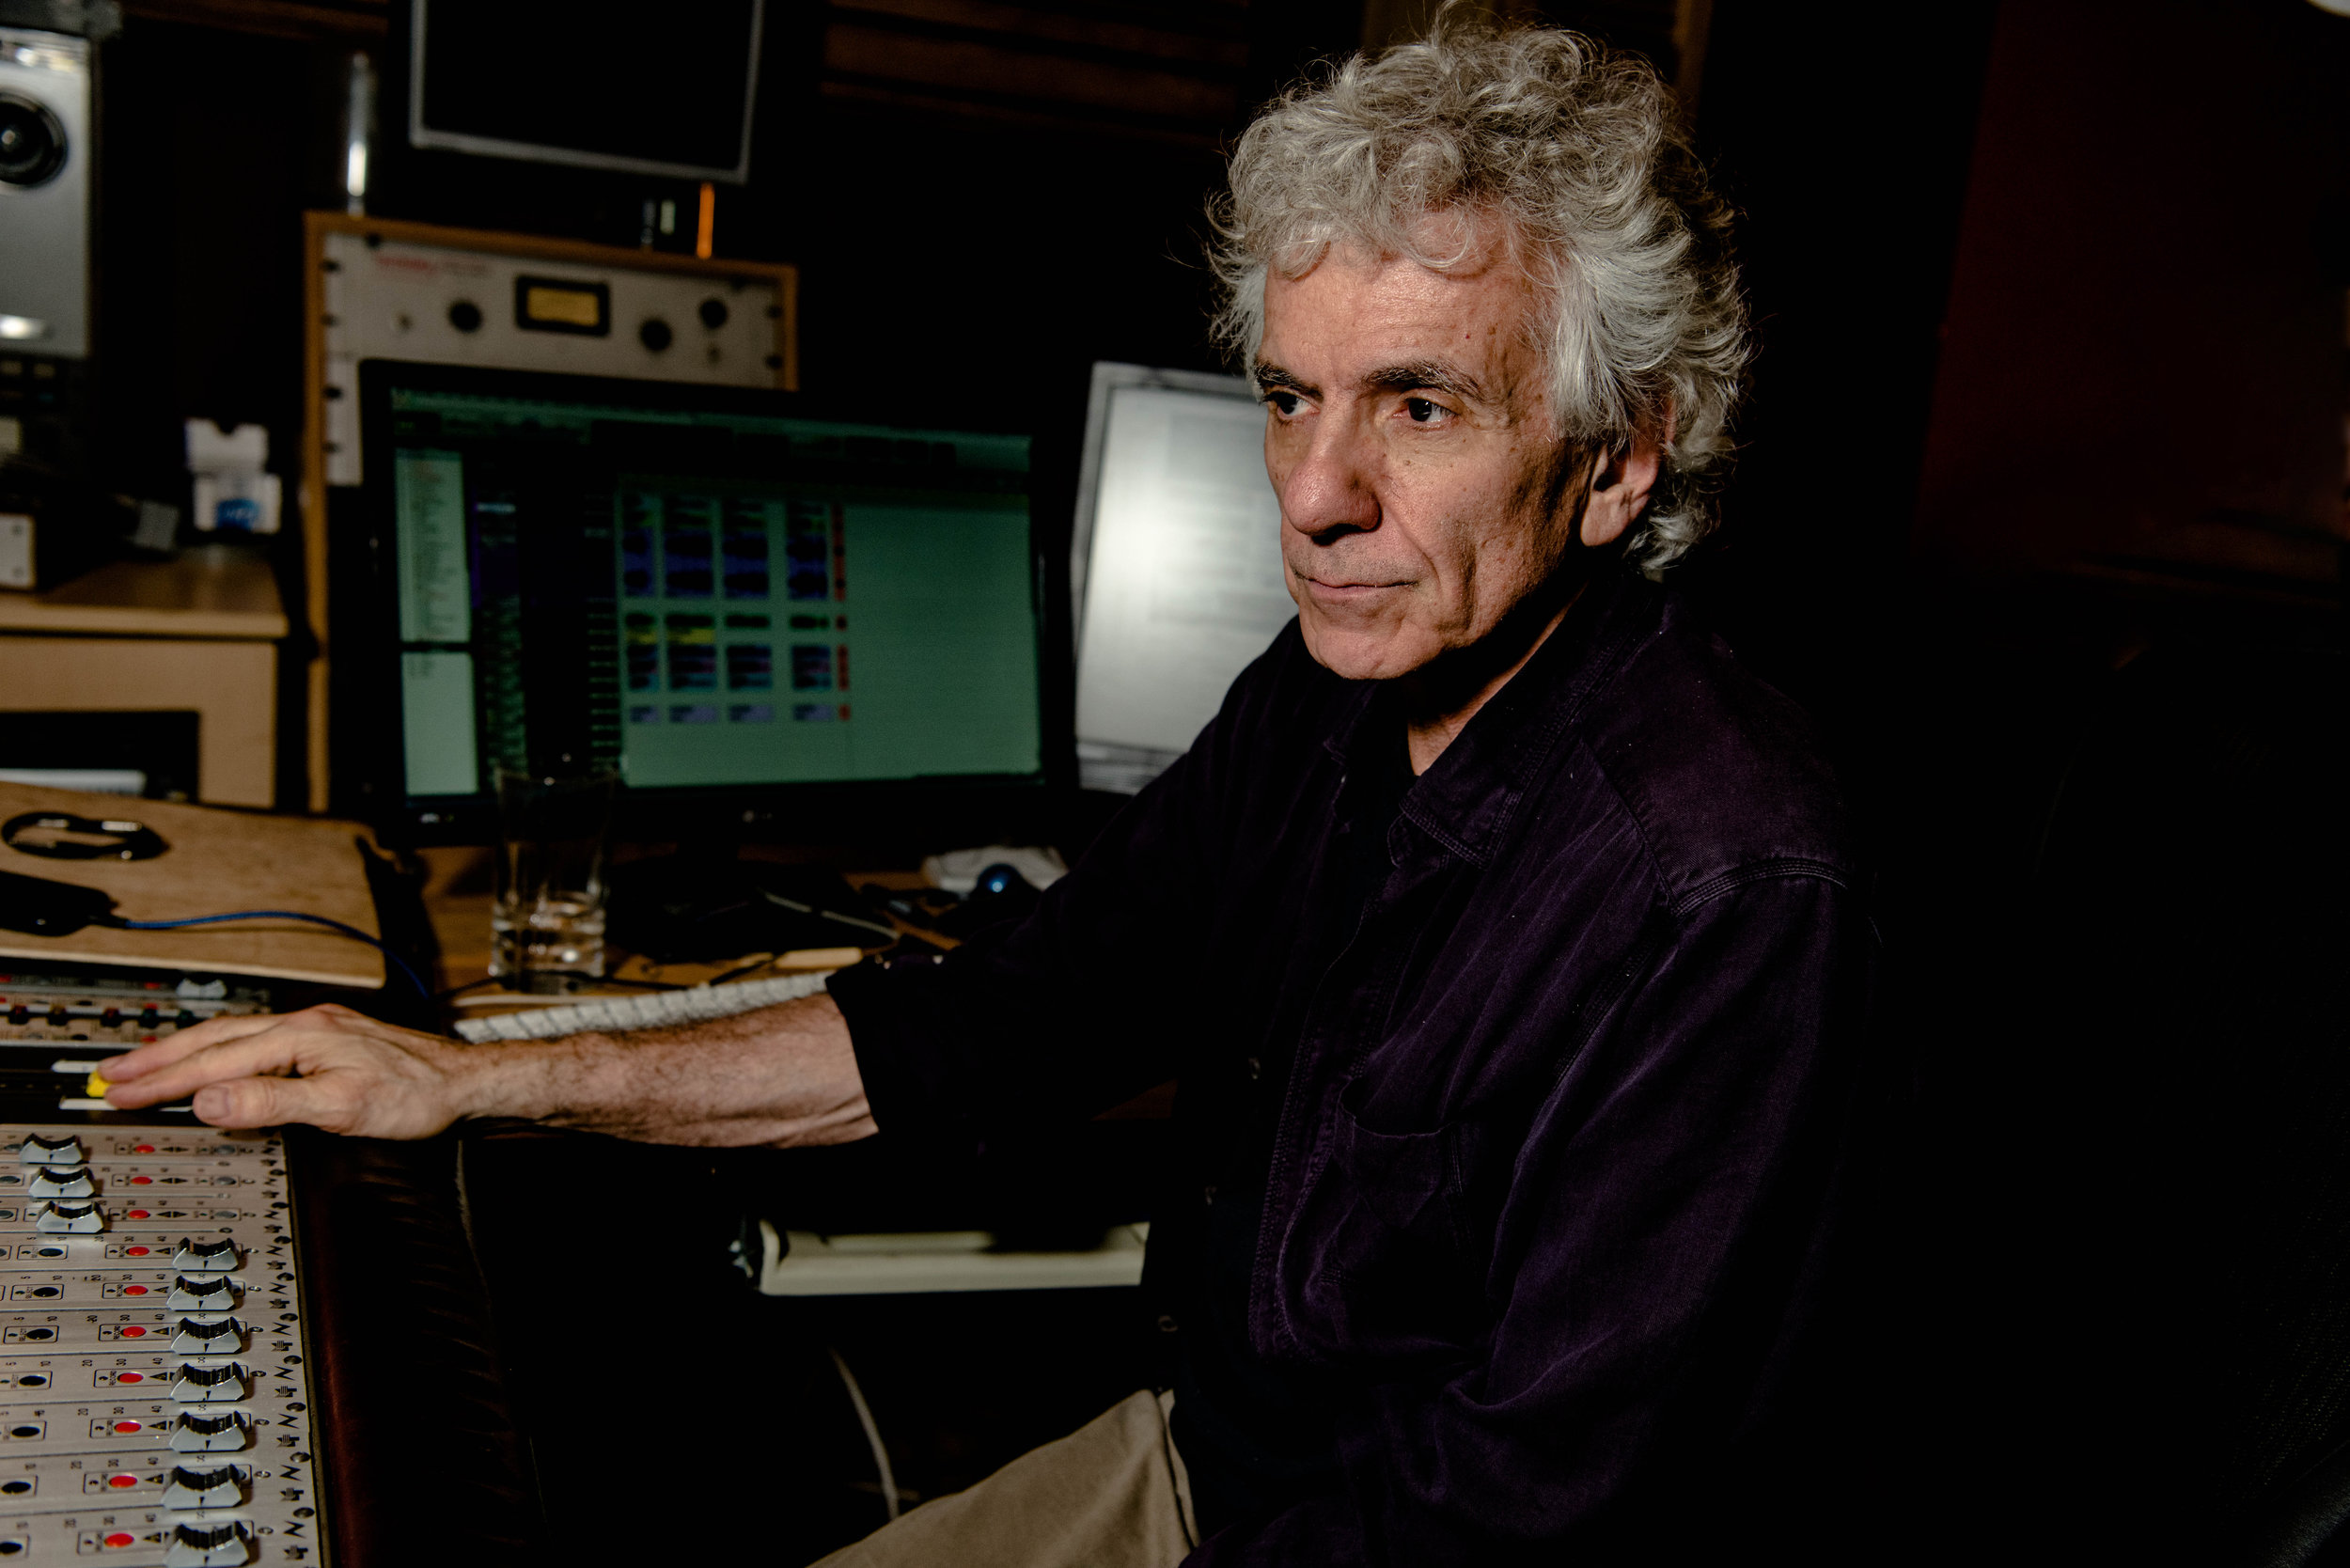 Legendary audio engineer Steve Addabbo